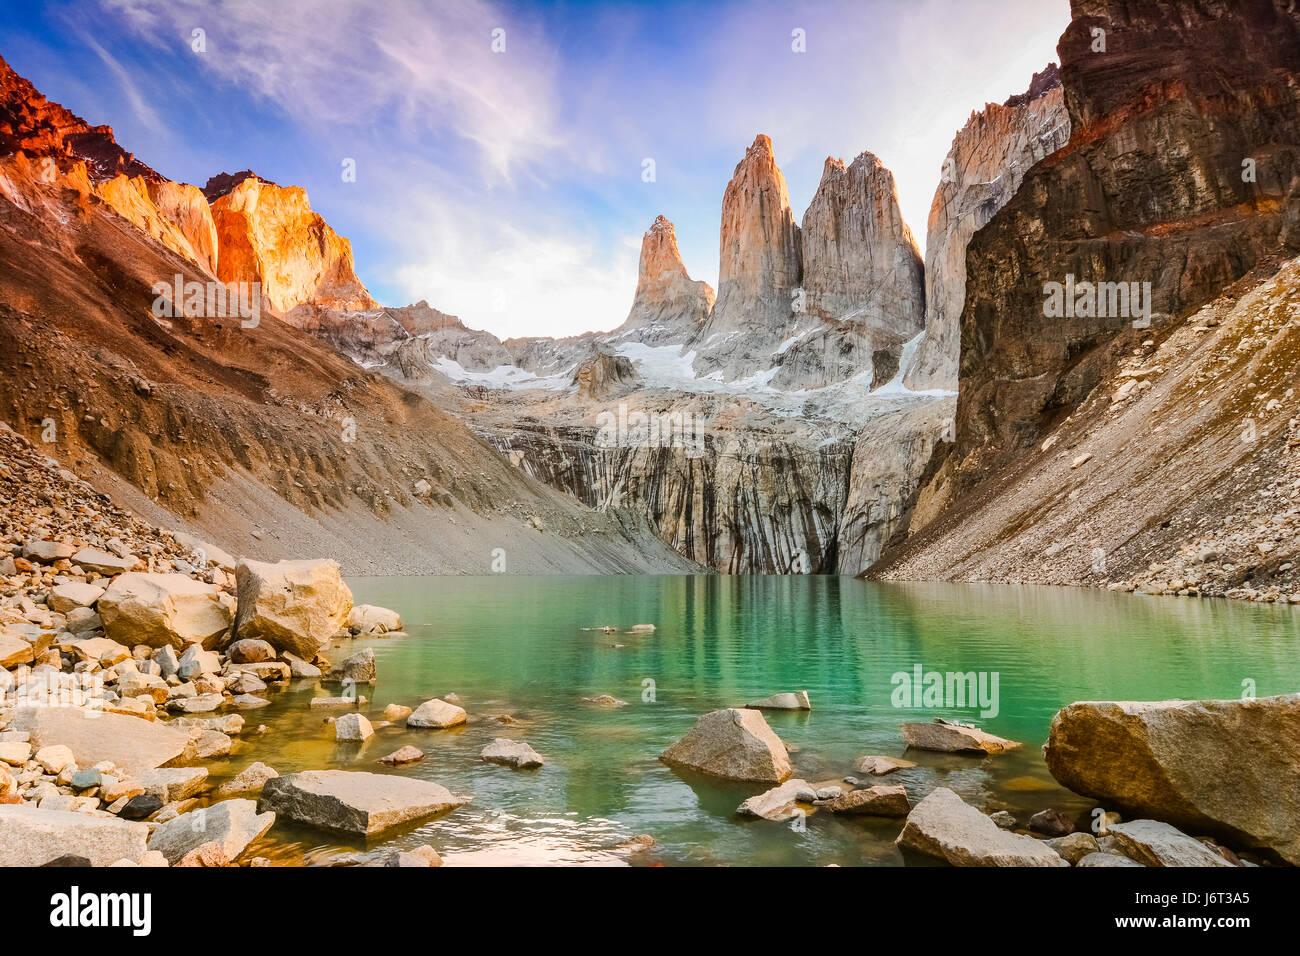 Parque Nacional Torres del Paine, Patagonia, Chile Imagen De Stock